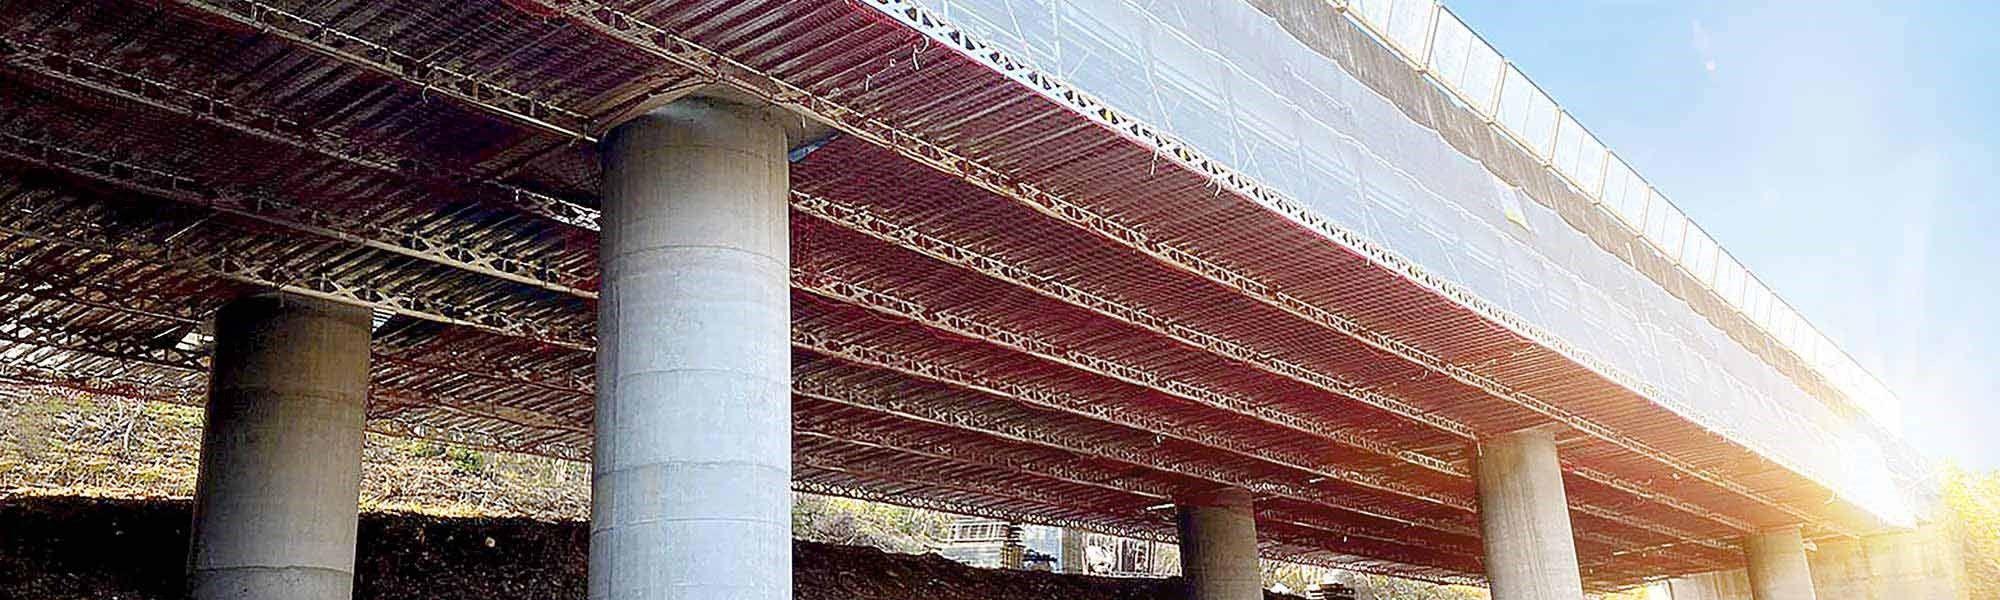 Da EuroEdile i ponteggi per costruire i ponti